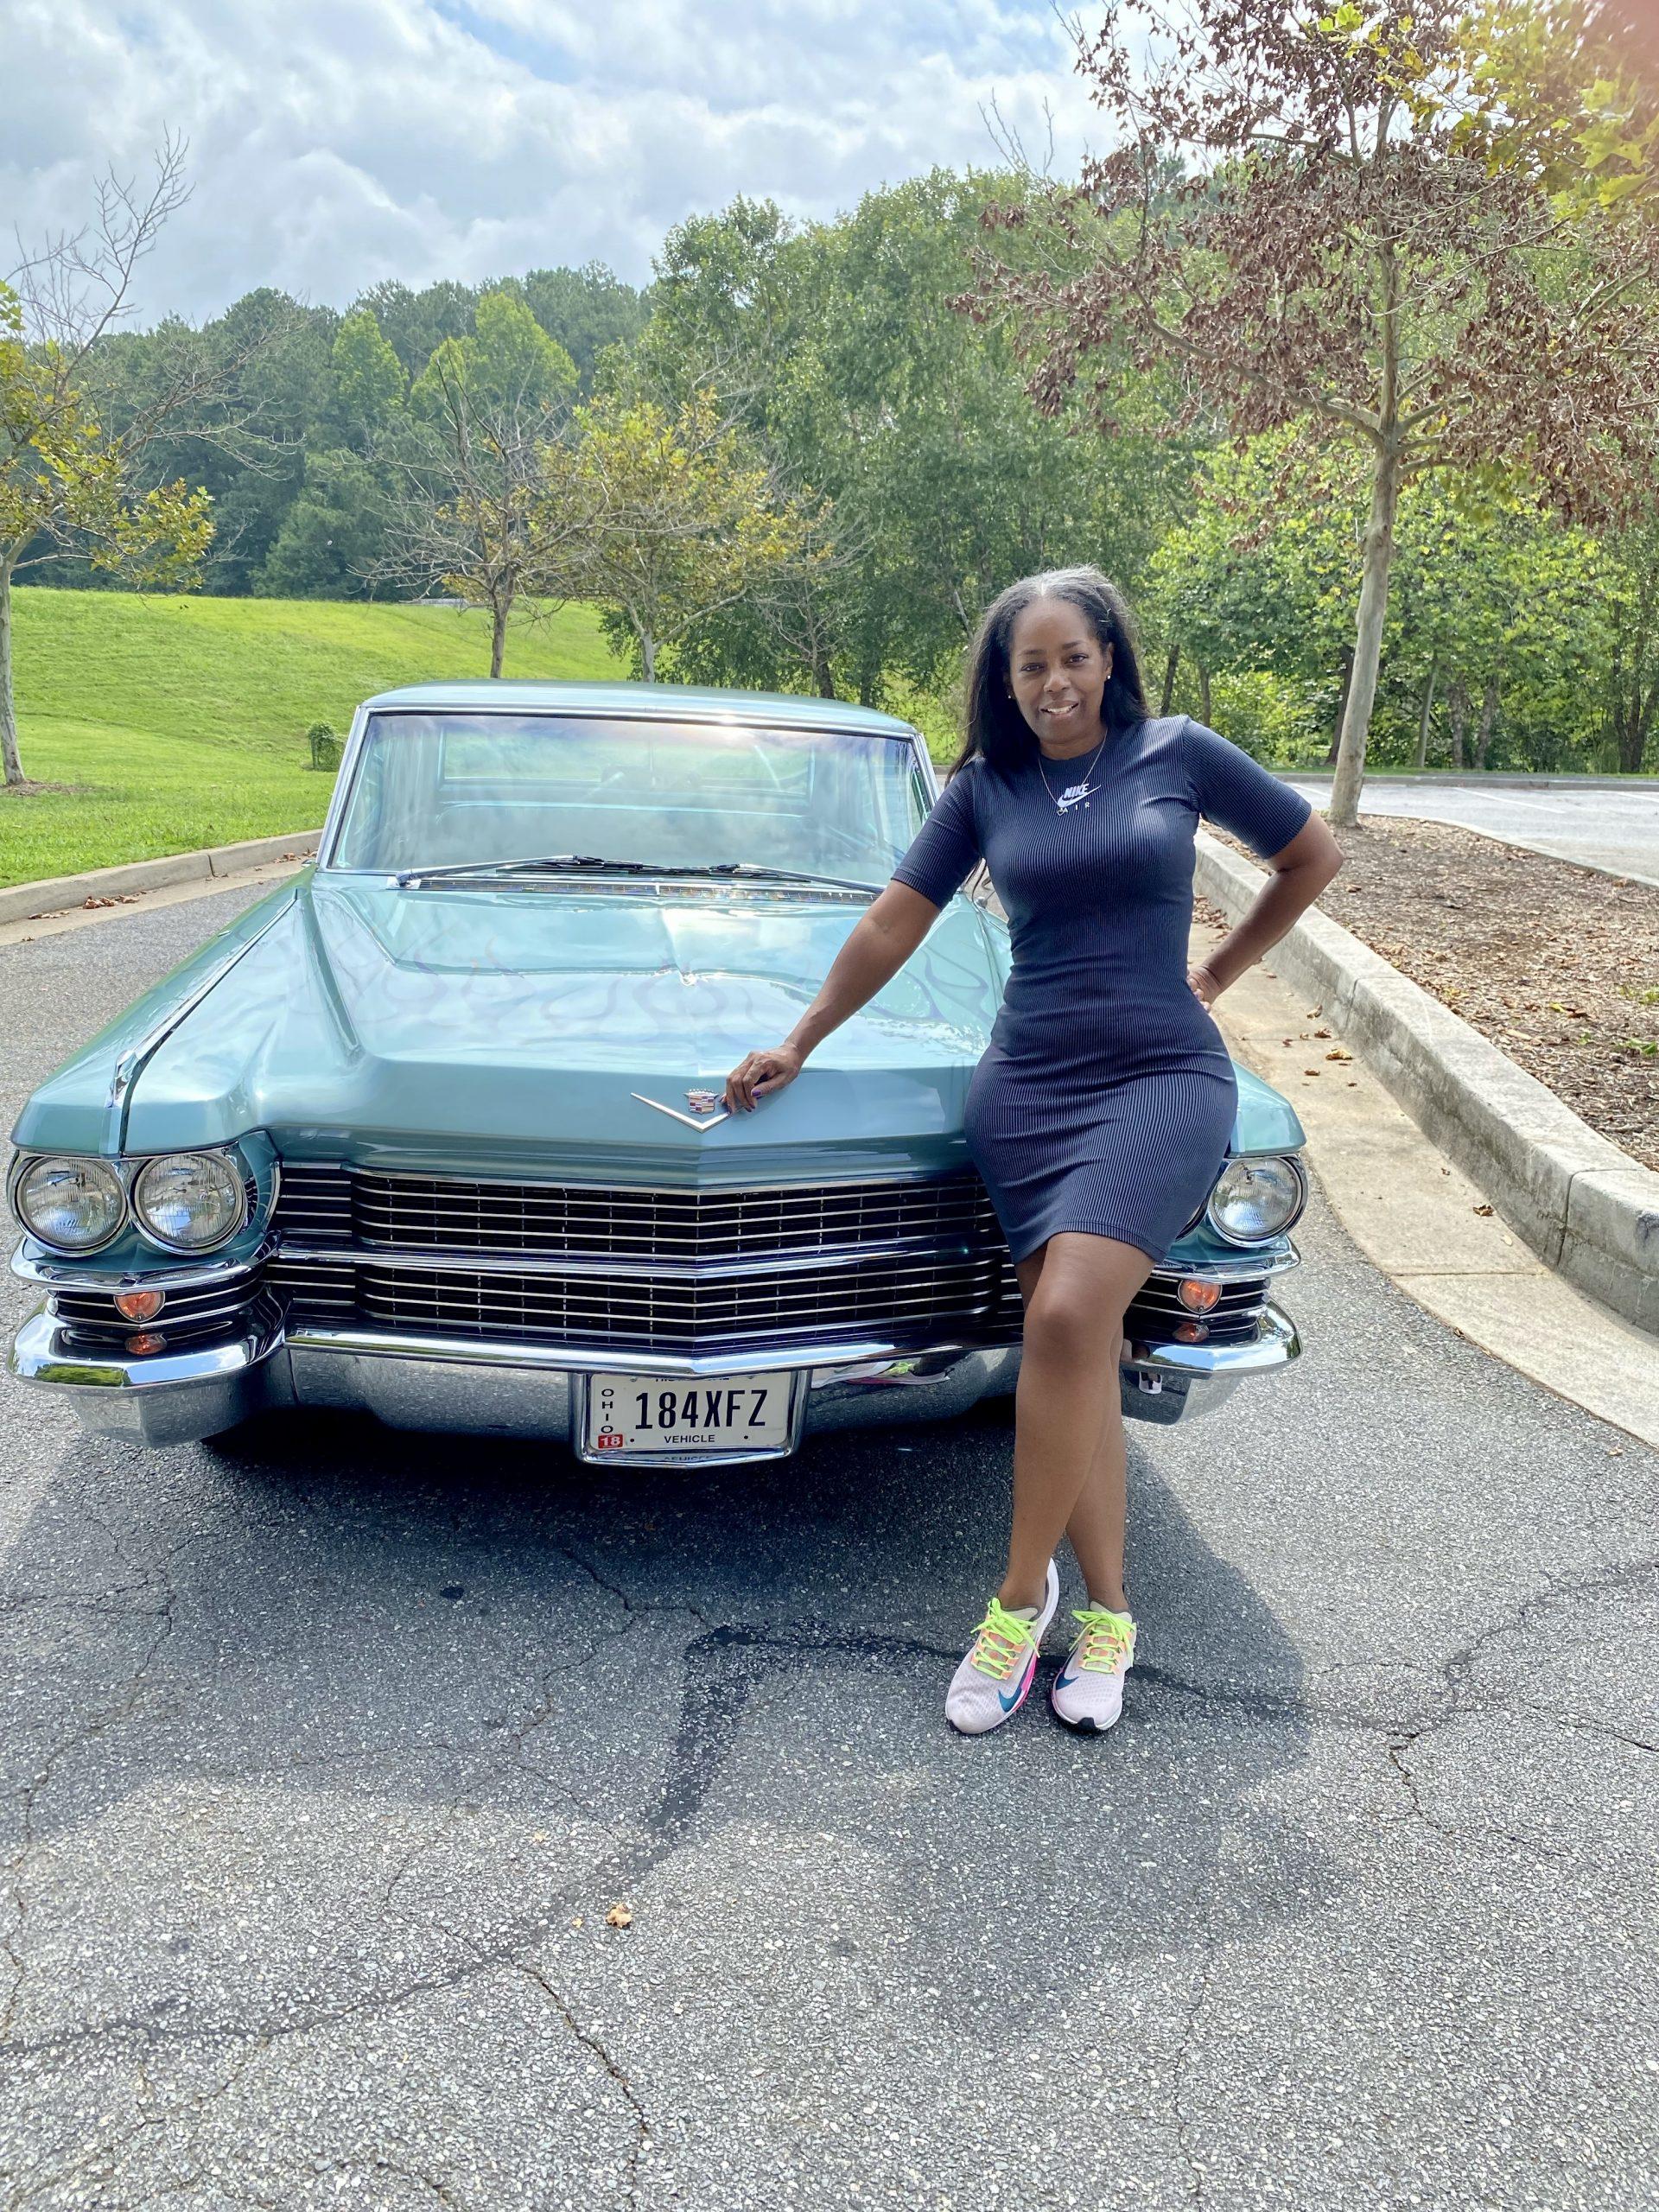 1963 Cadillac Coupe De Ville, What A Classy Ride